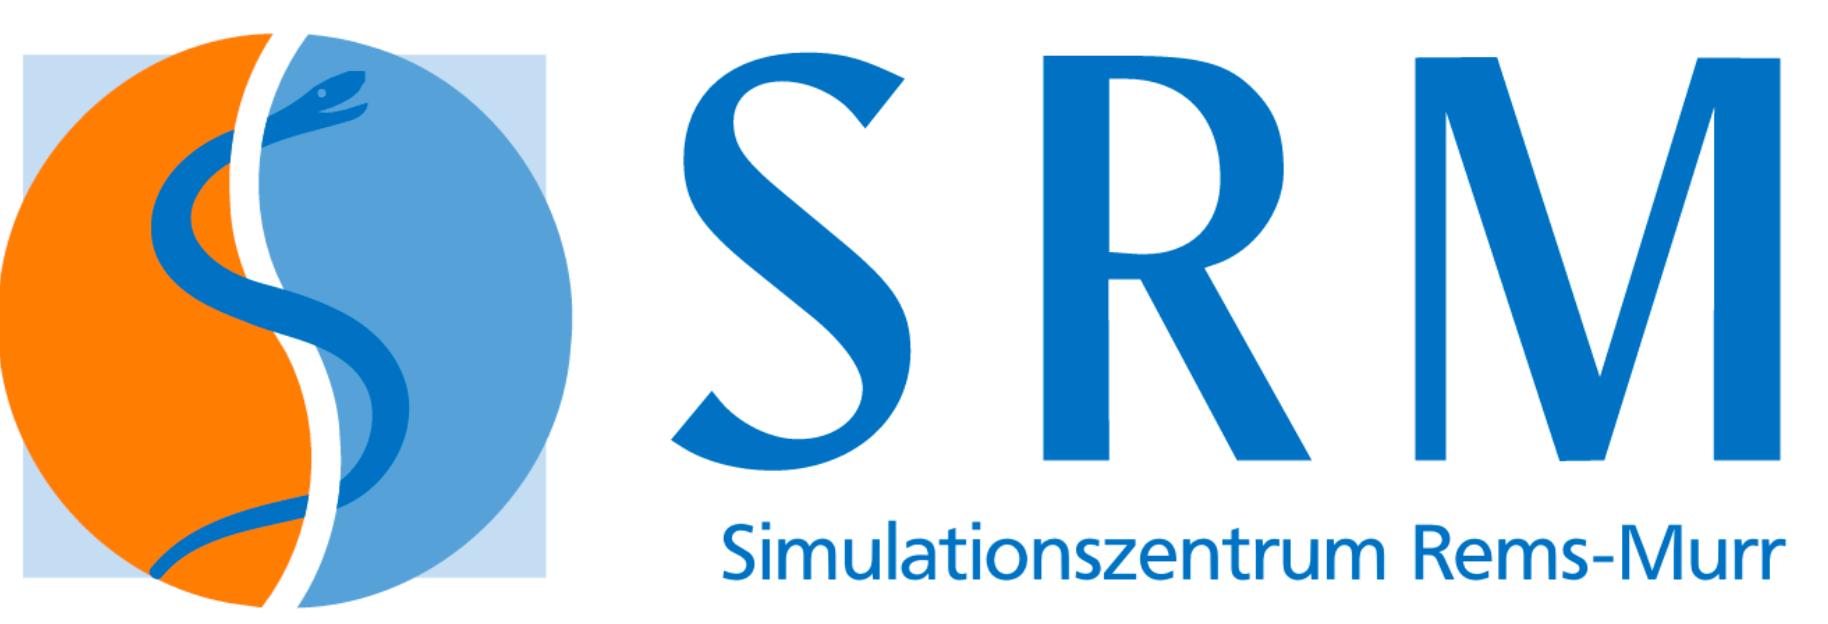 Simulationszentrum Rems-Murr